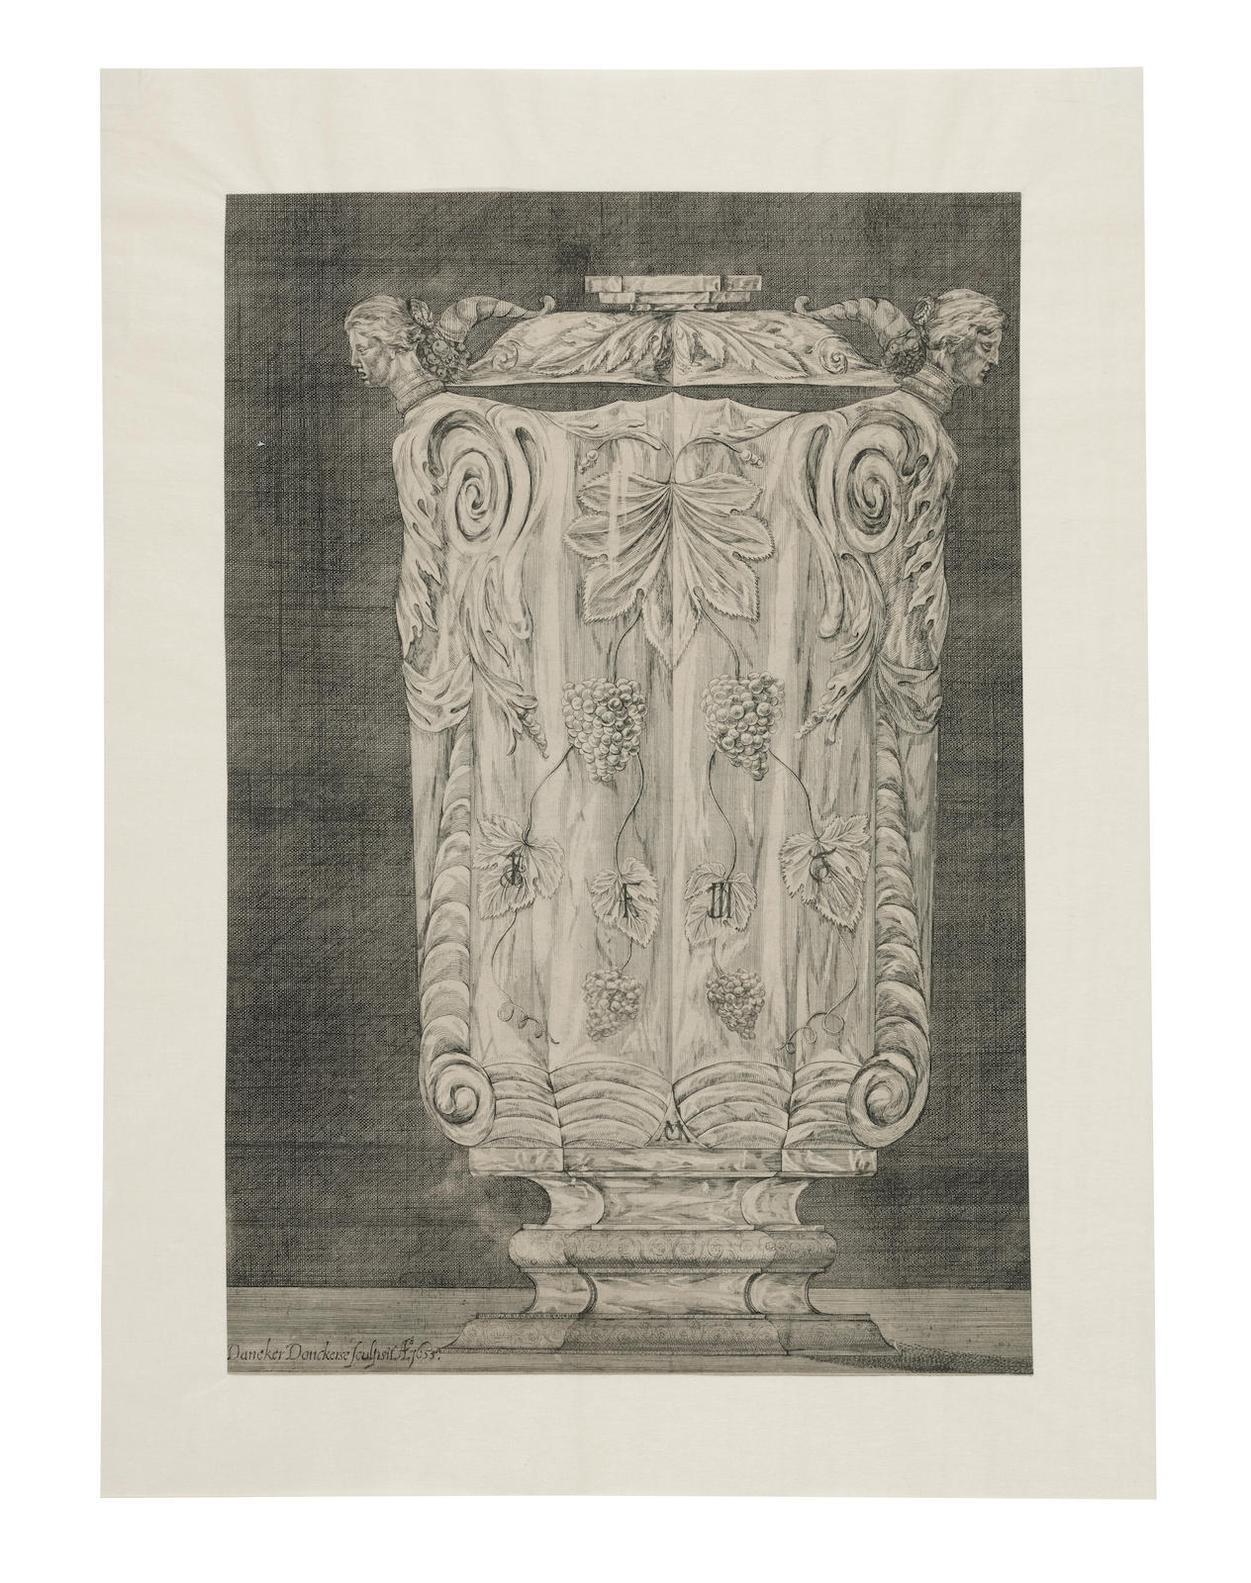 Dancker Danckerts - The Crystal Vase Of Emperor Ferdinand Iii In The Treasury In Vienna-1655